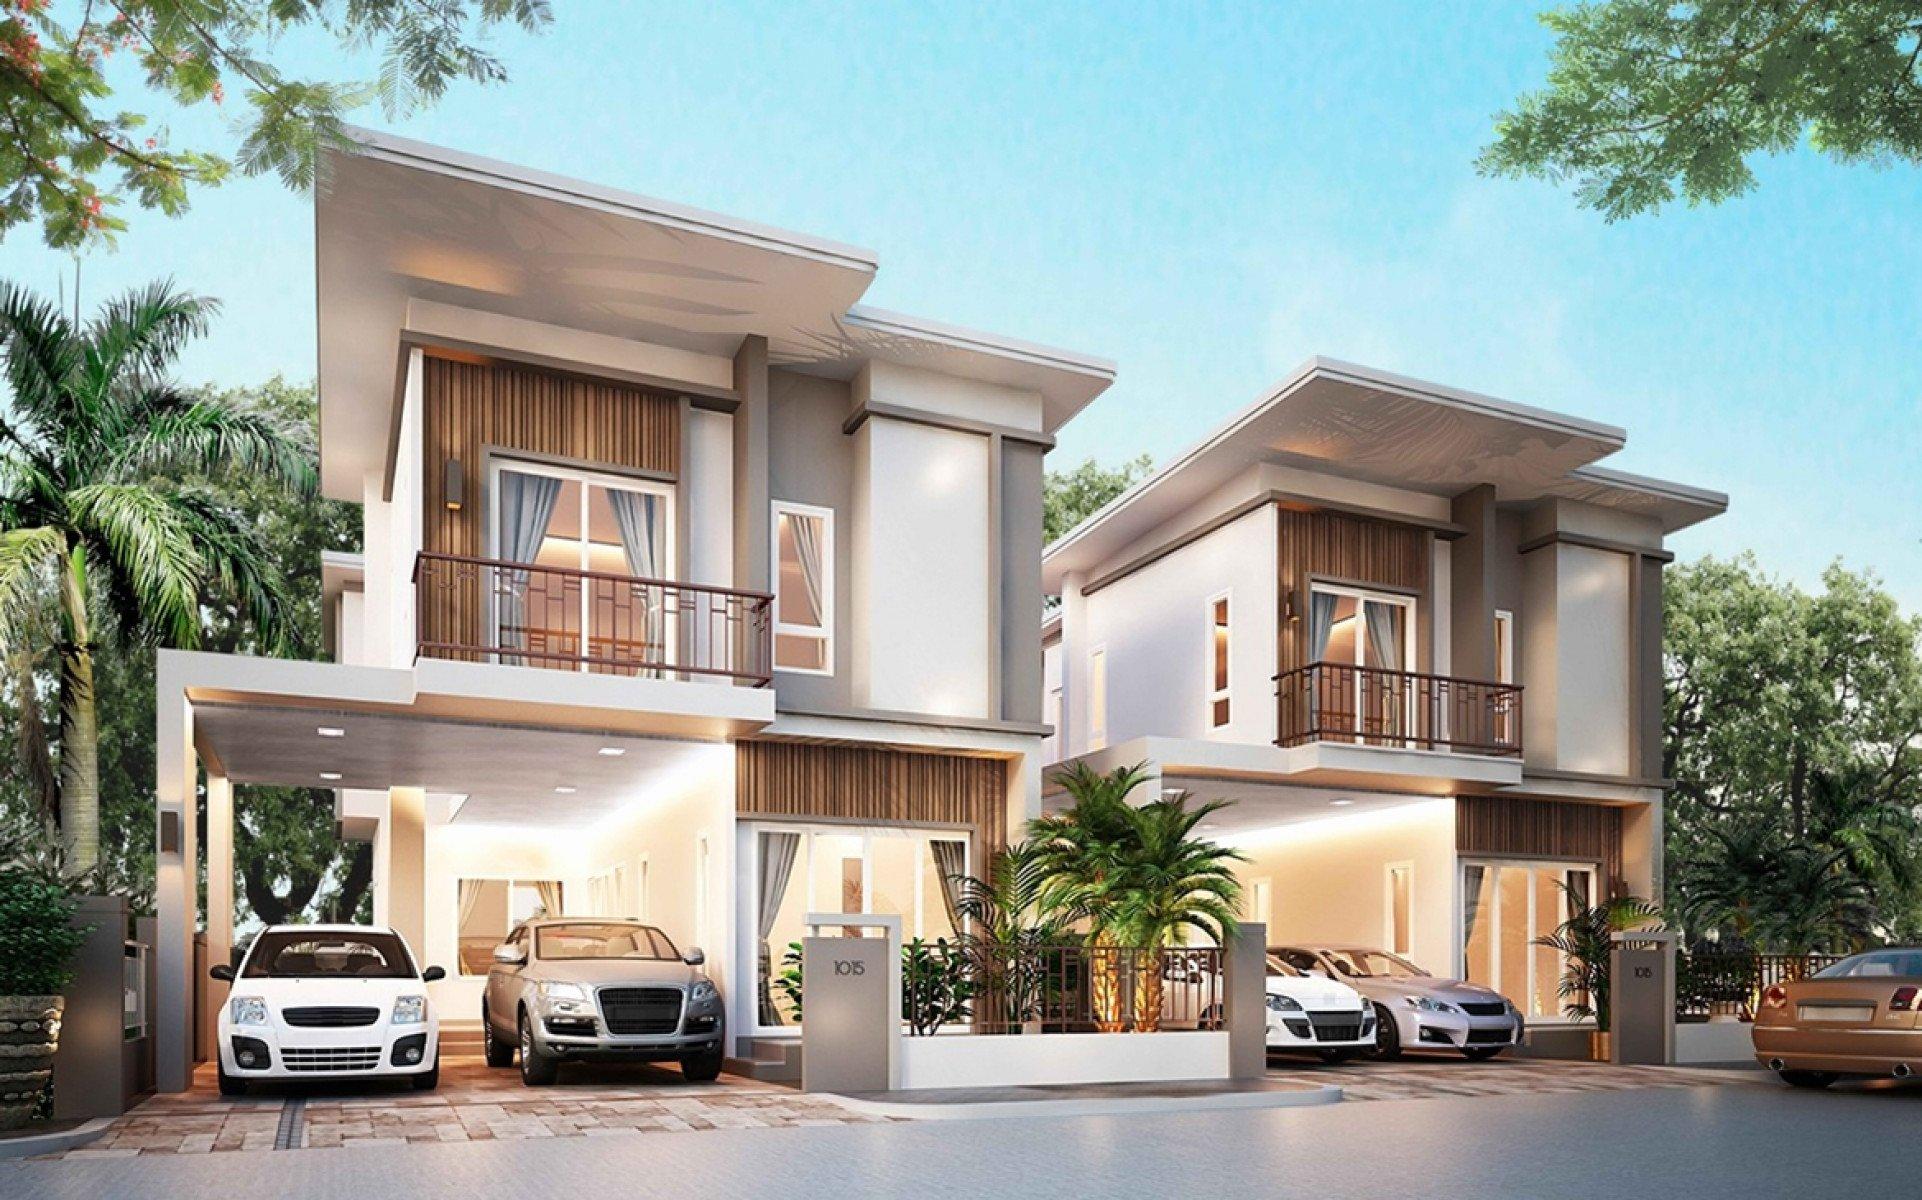 2-storey twin house free